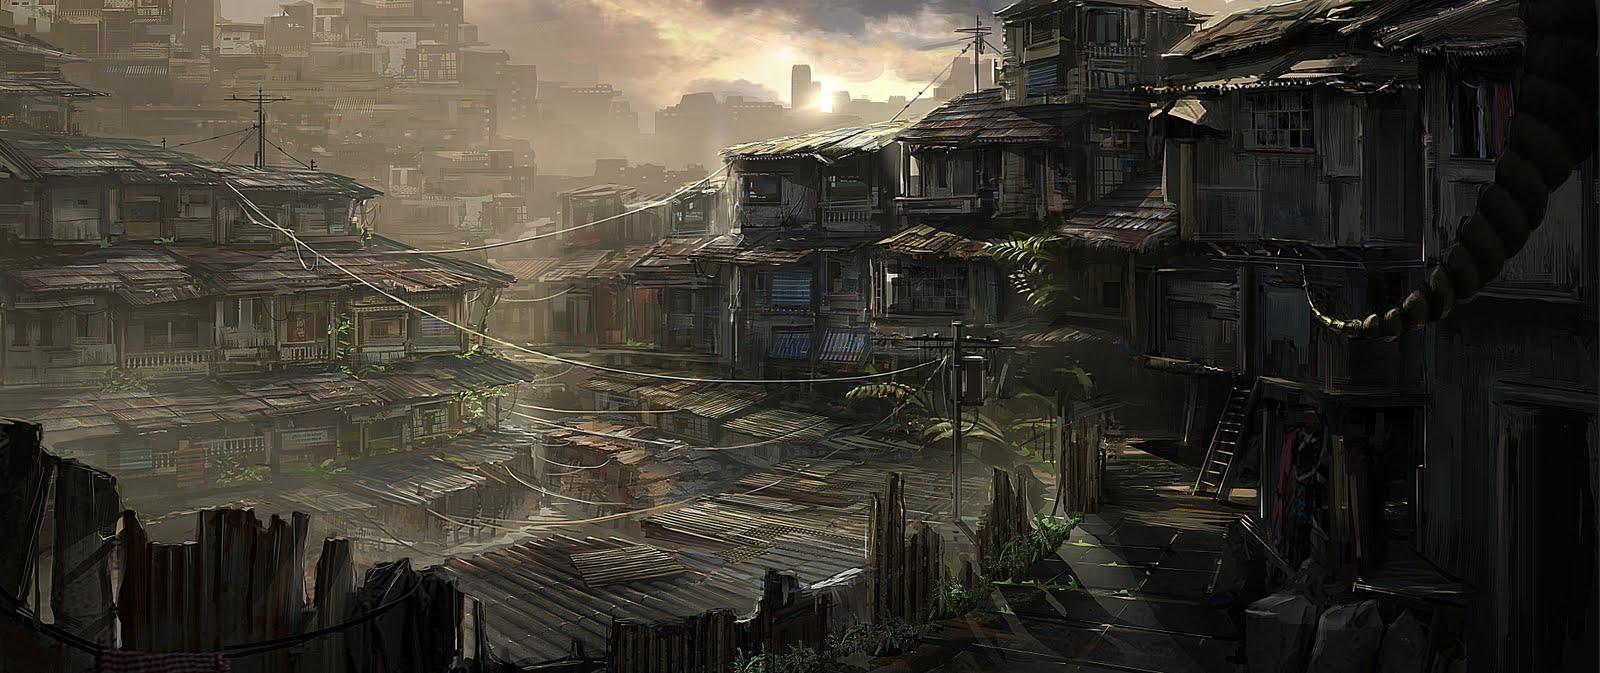 [Image: slum.jpg]